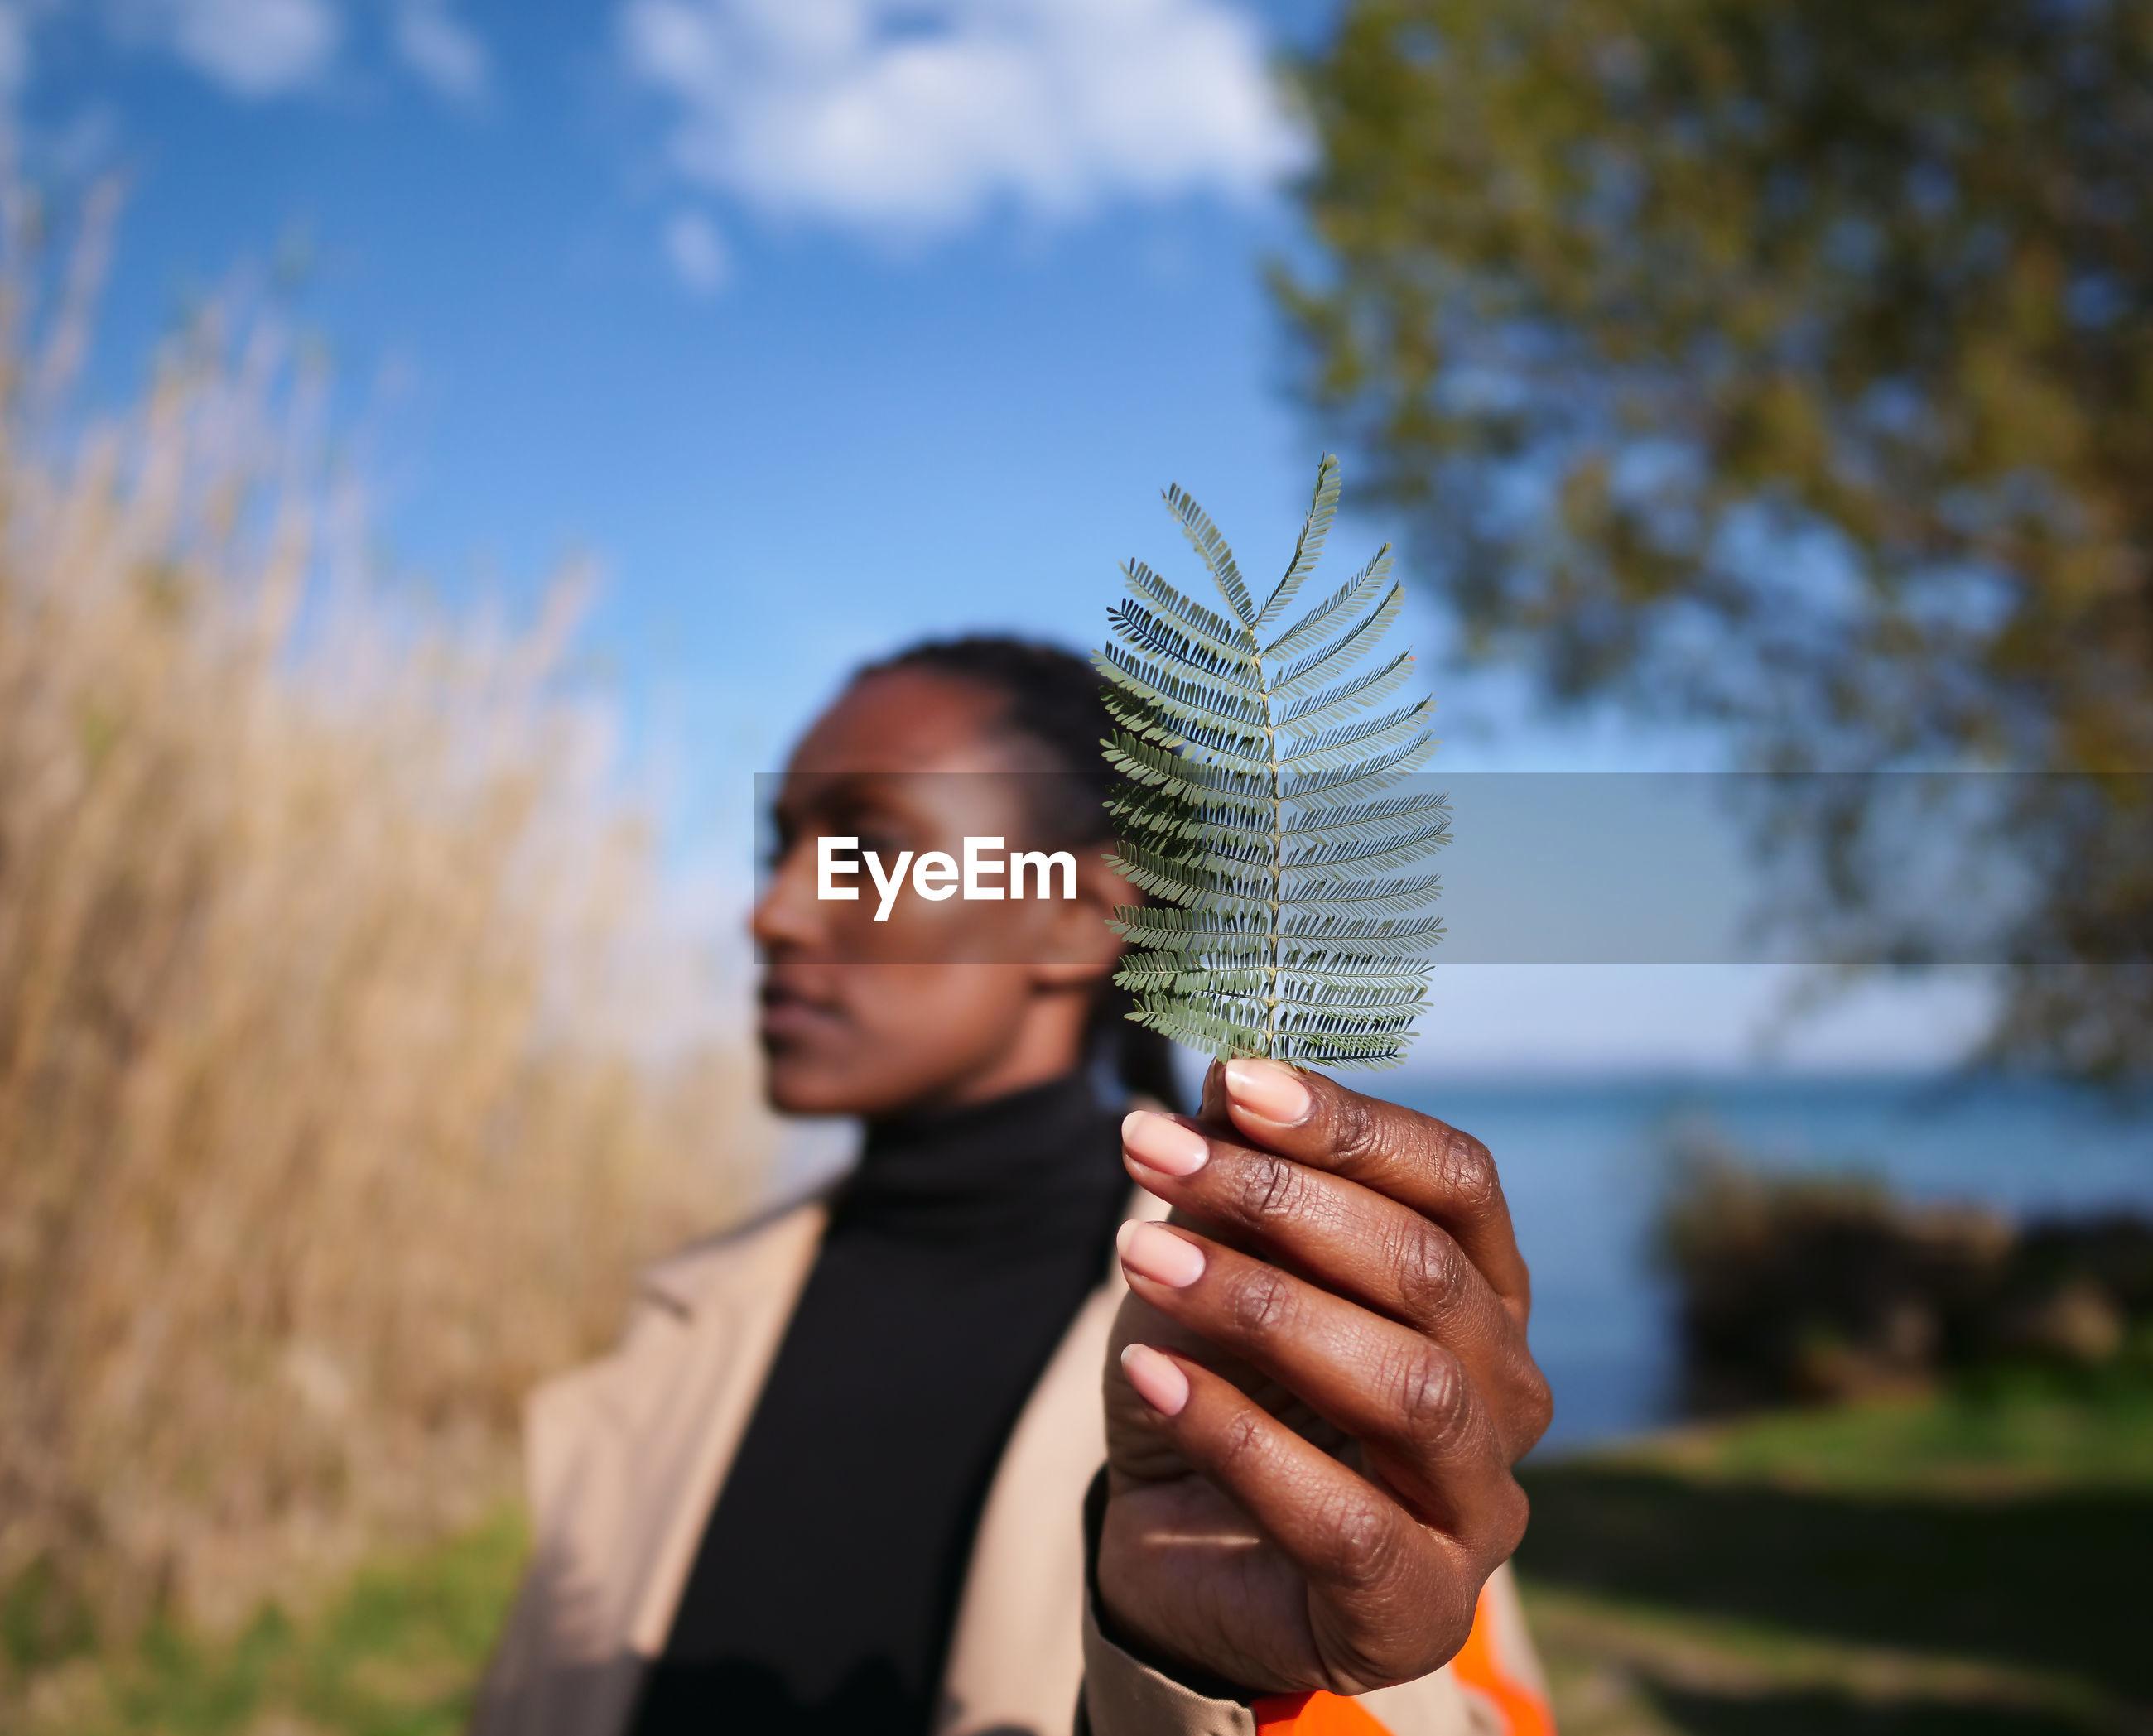 Woman holding fern against sky